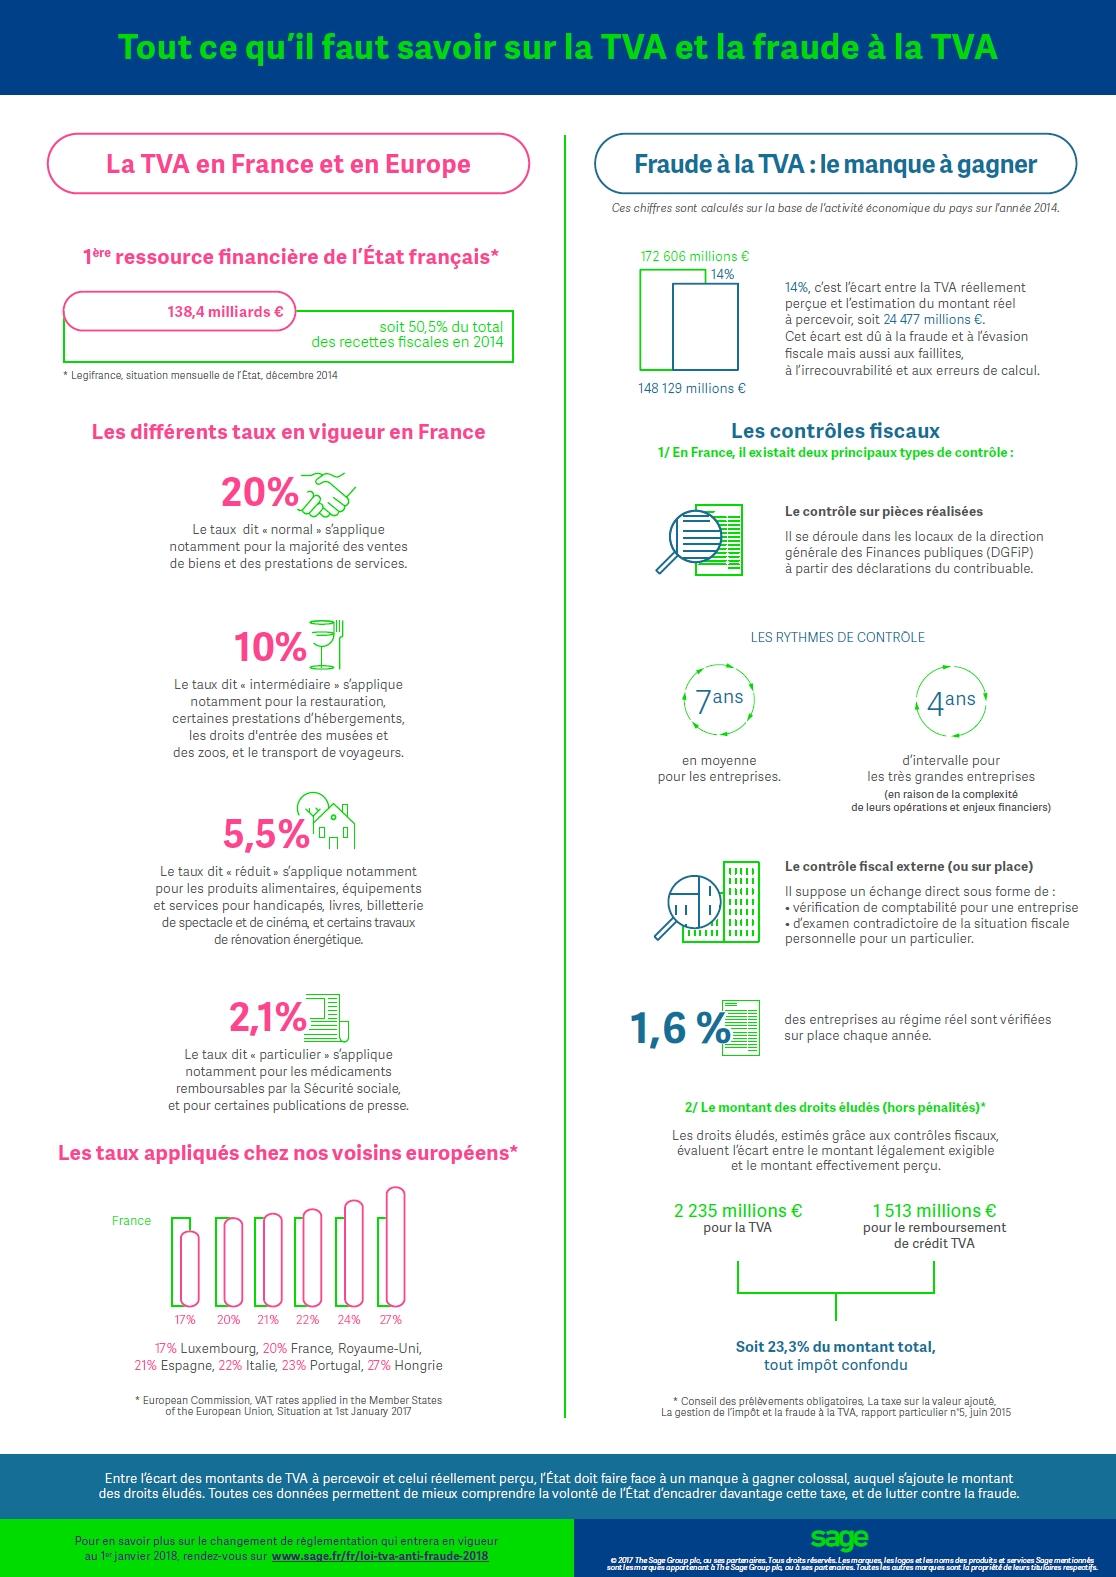 Infographie : Loi anti-fraude à la TVA